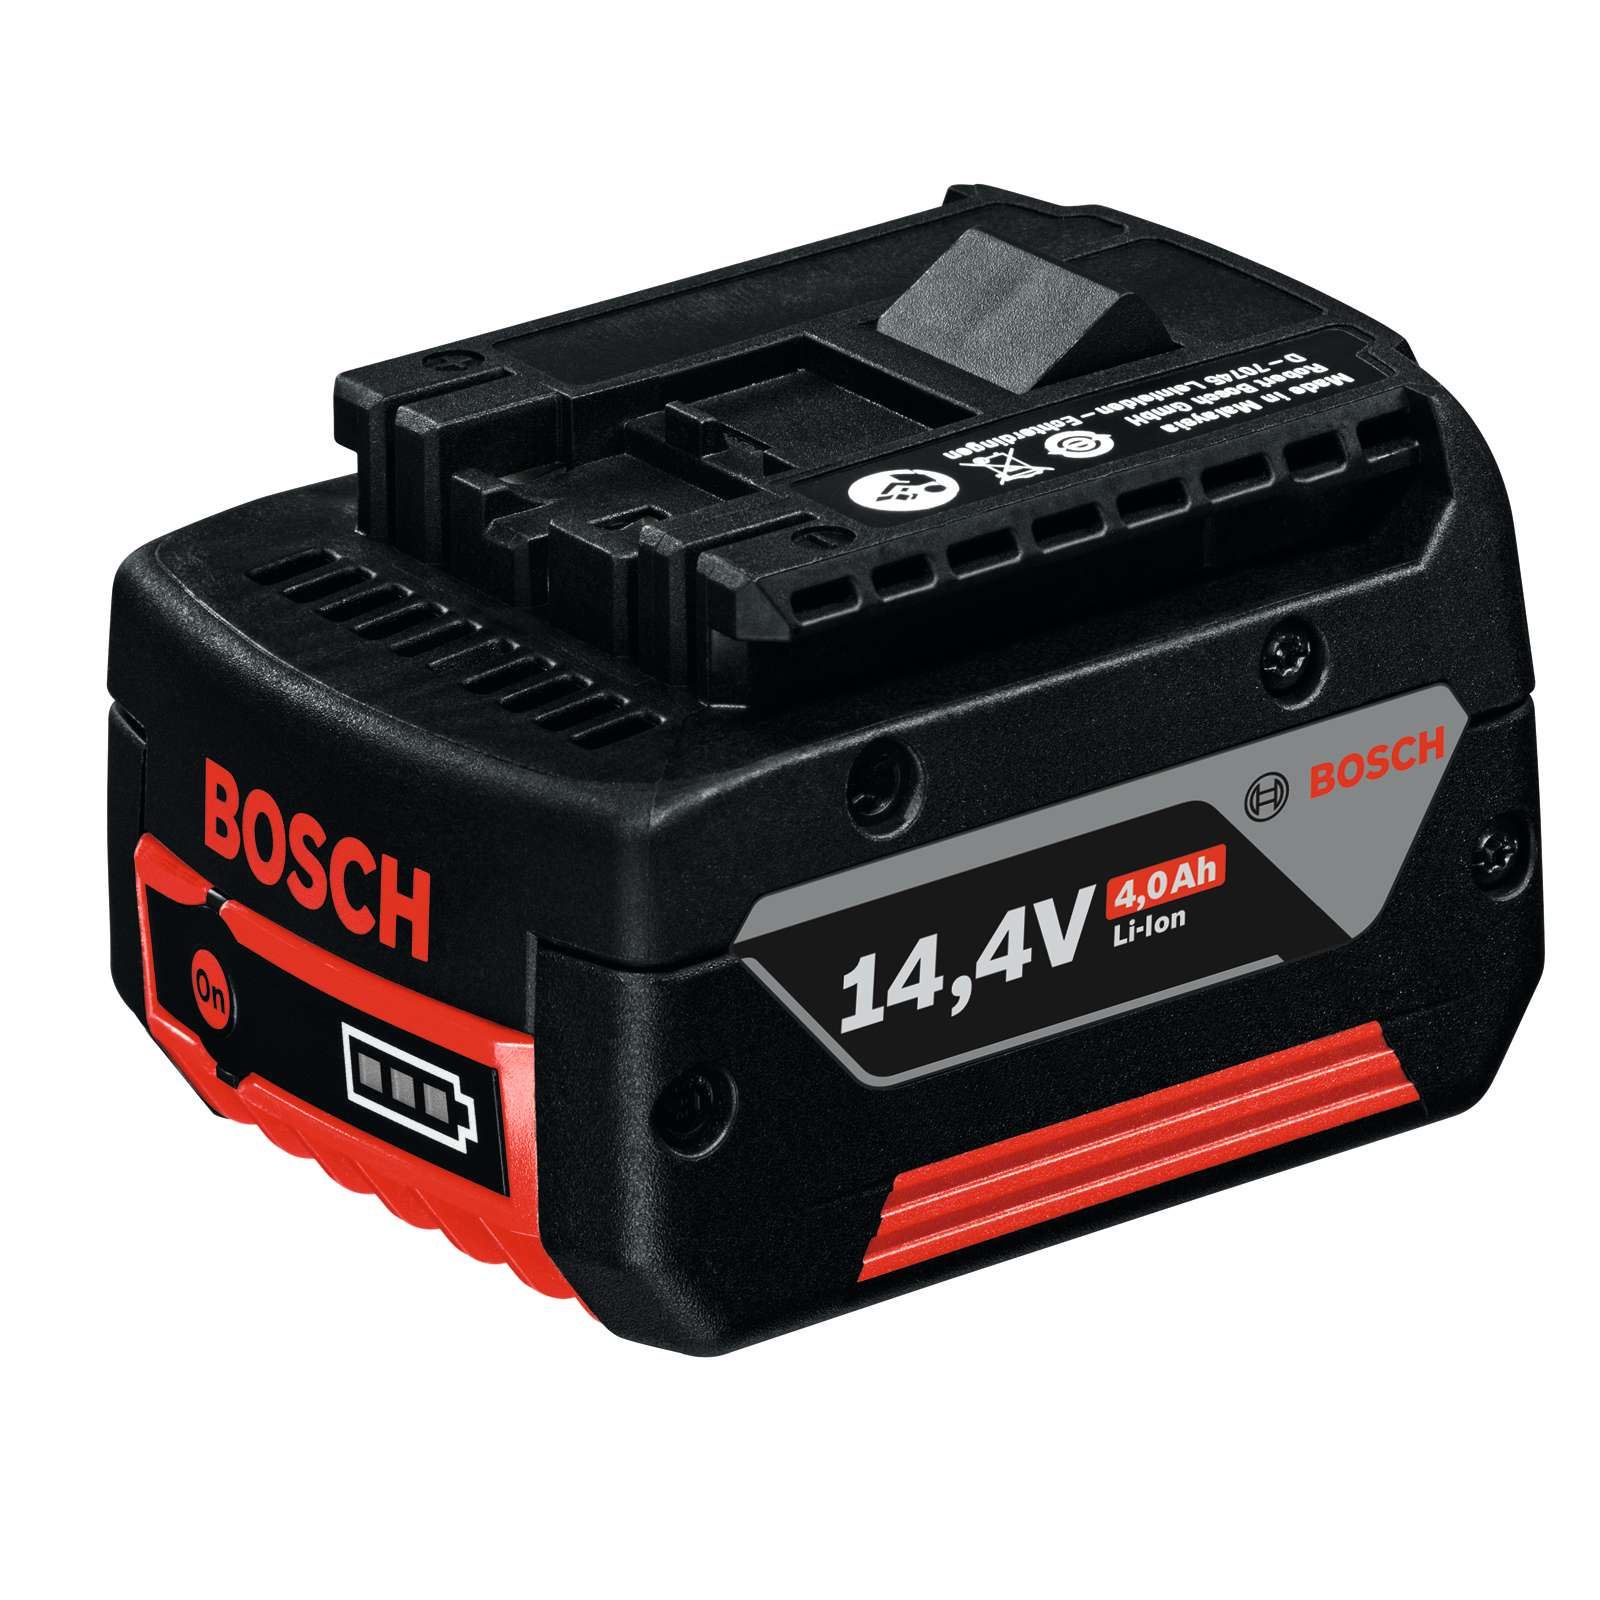 Аккумуляторный блок GBA 14,4 V 4.0 Ah M-C